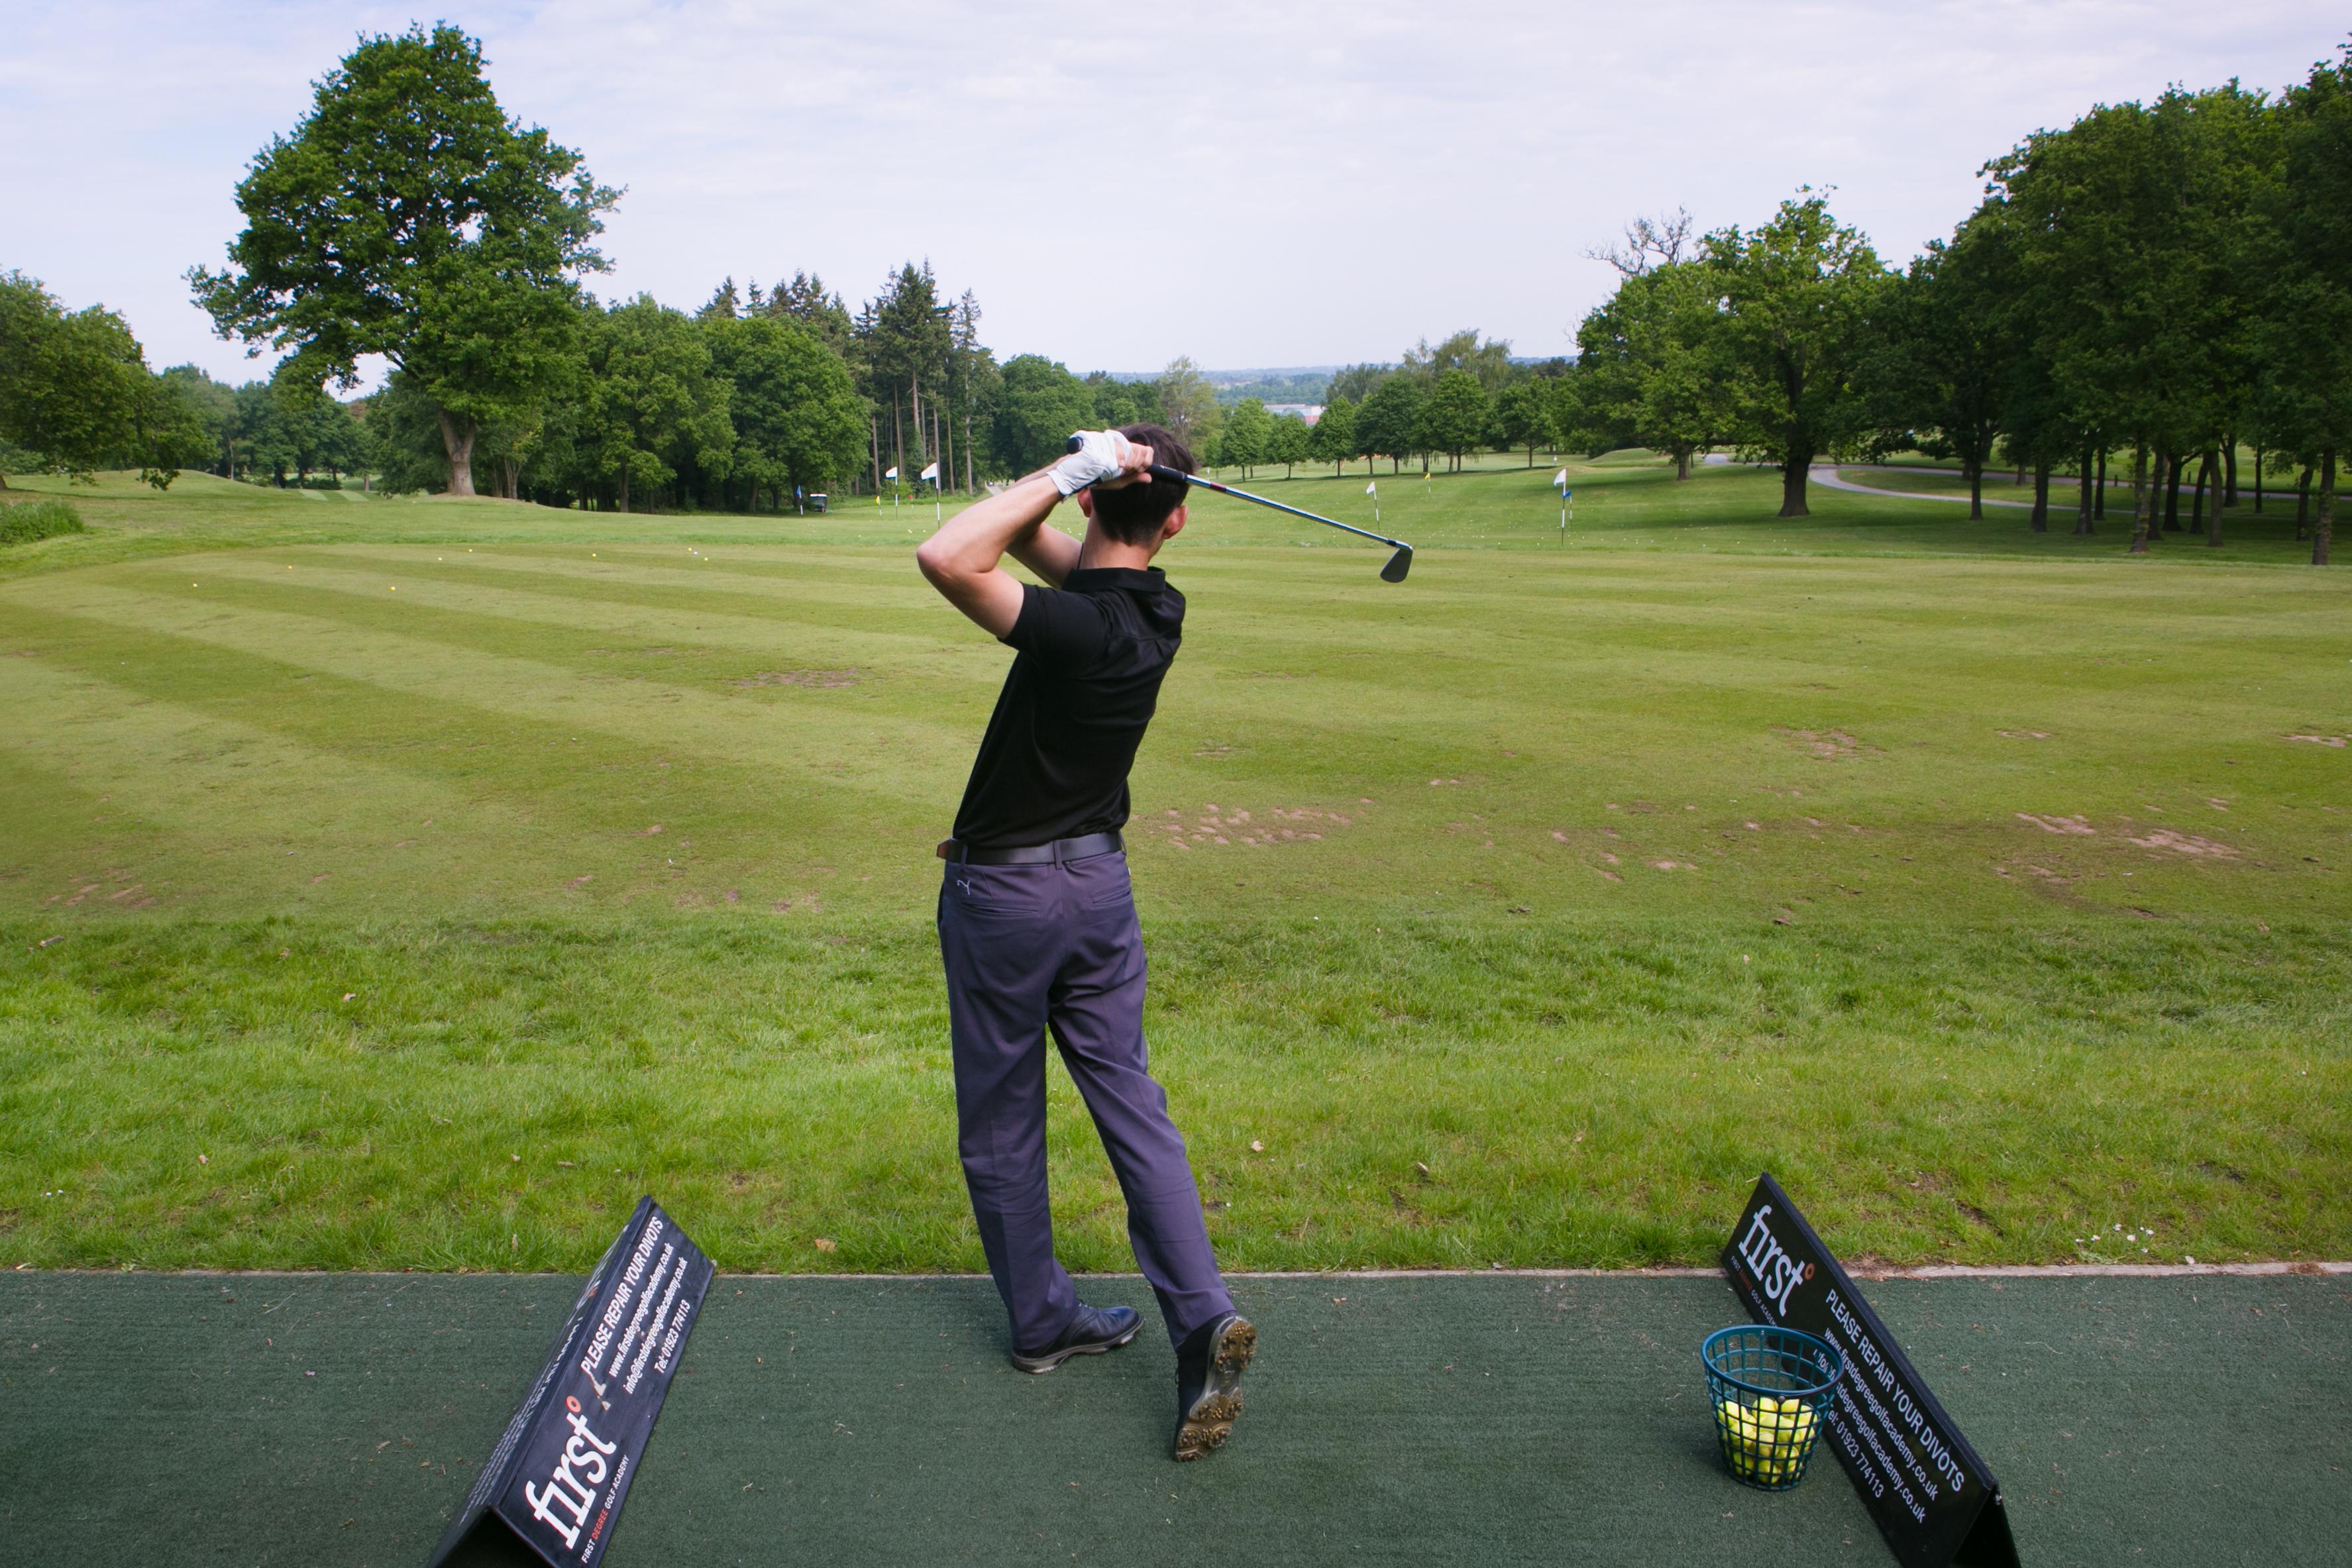 Golfer on driving range